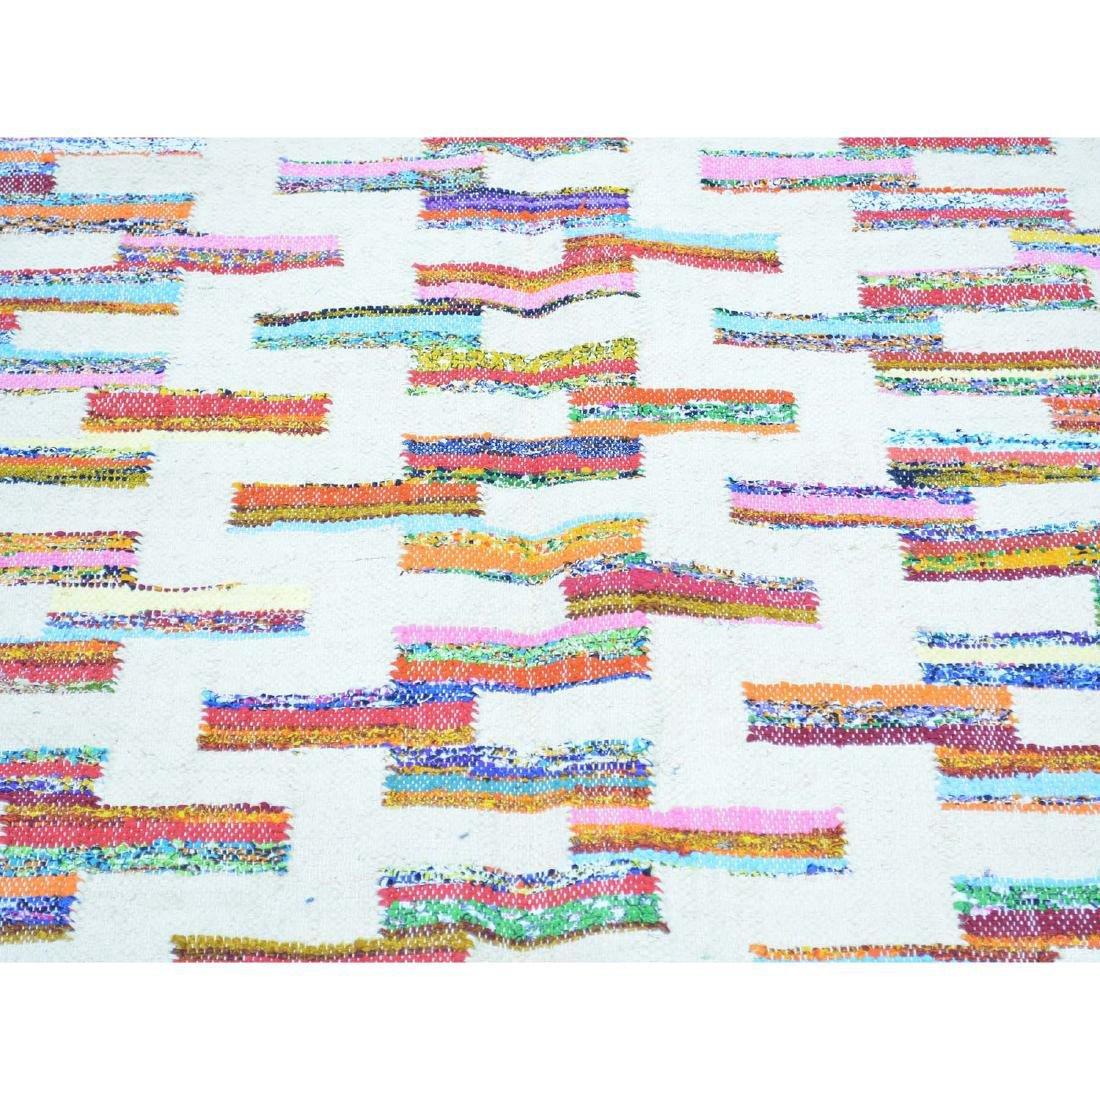 Cotton Sari Silk Flat Weave Kilim Hand Woven Rug 5x7.1 - 4